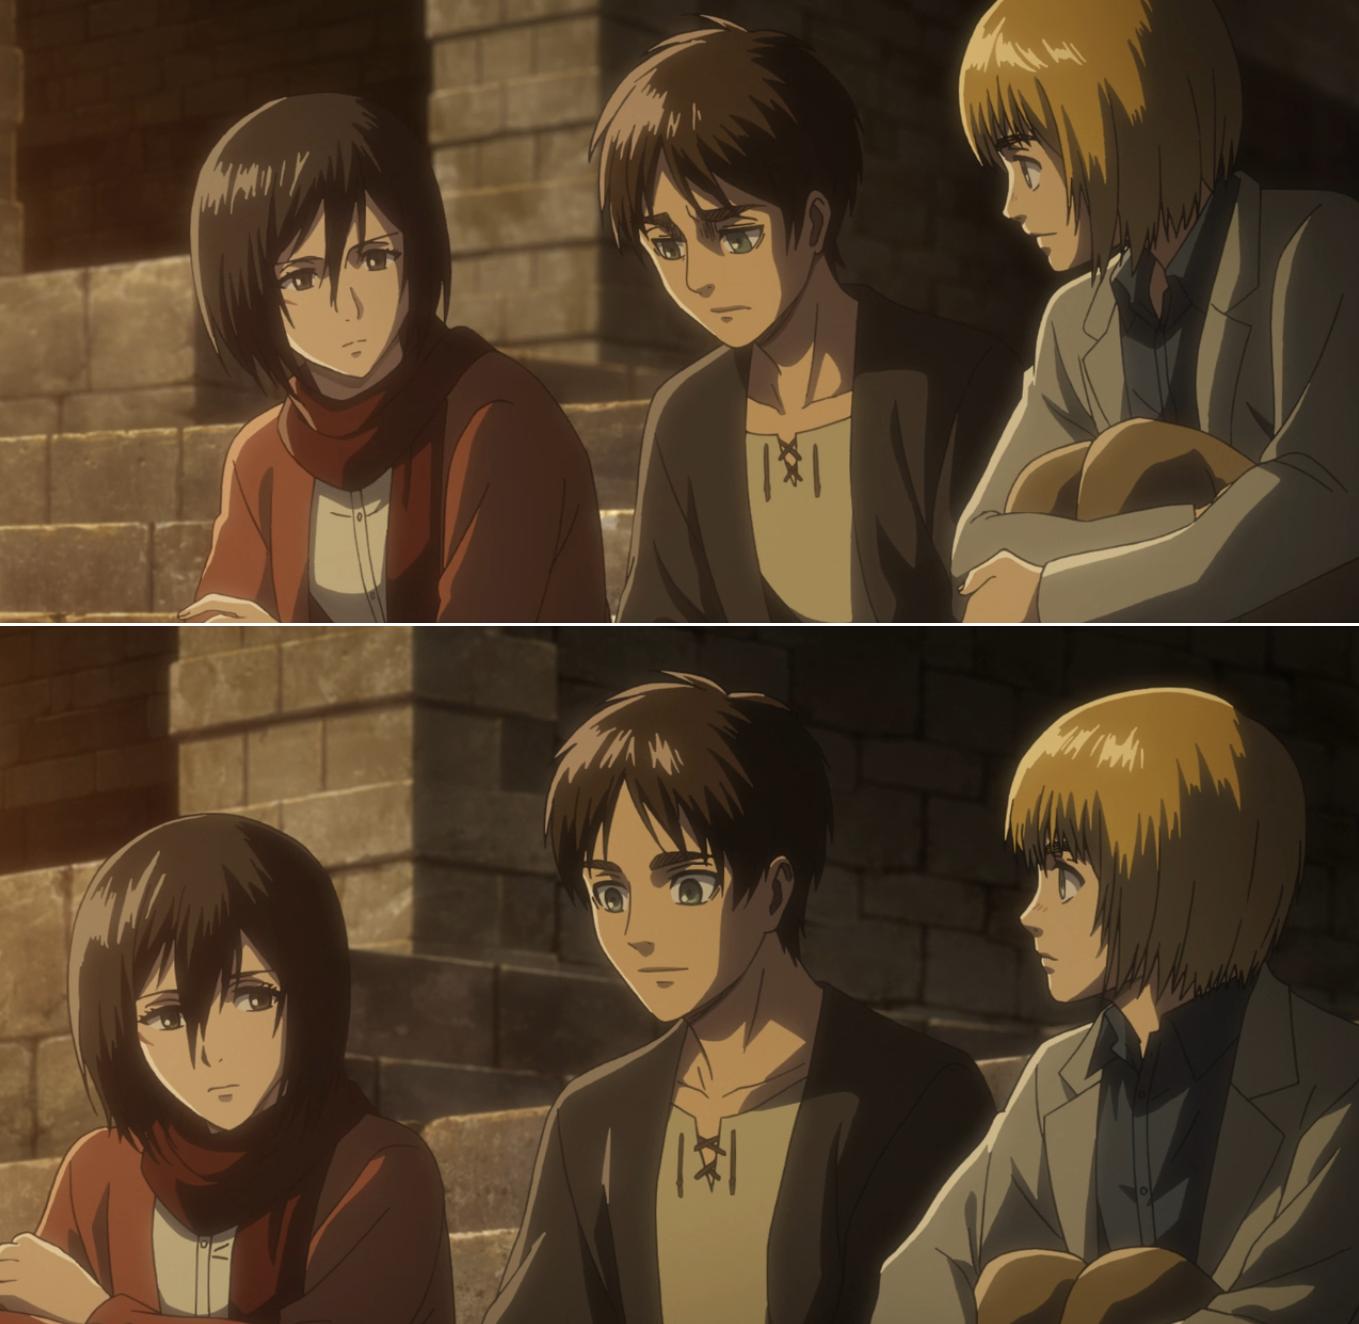 Eren Armin and Mikasa AoT season 3 Attack on titan